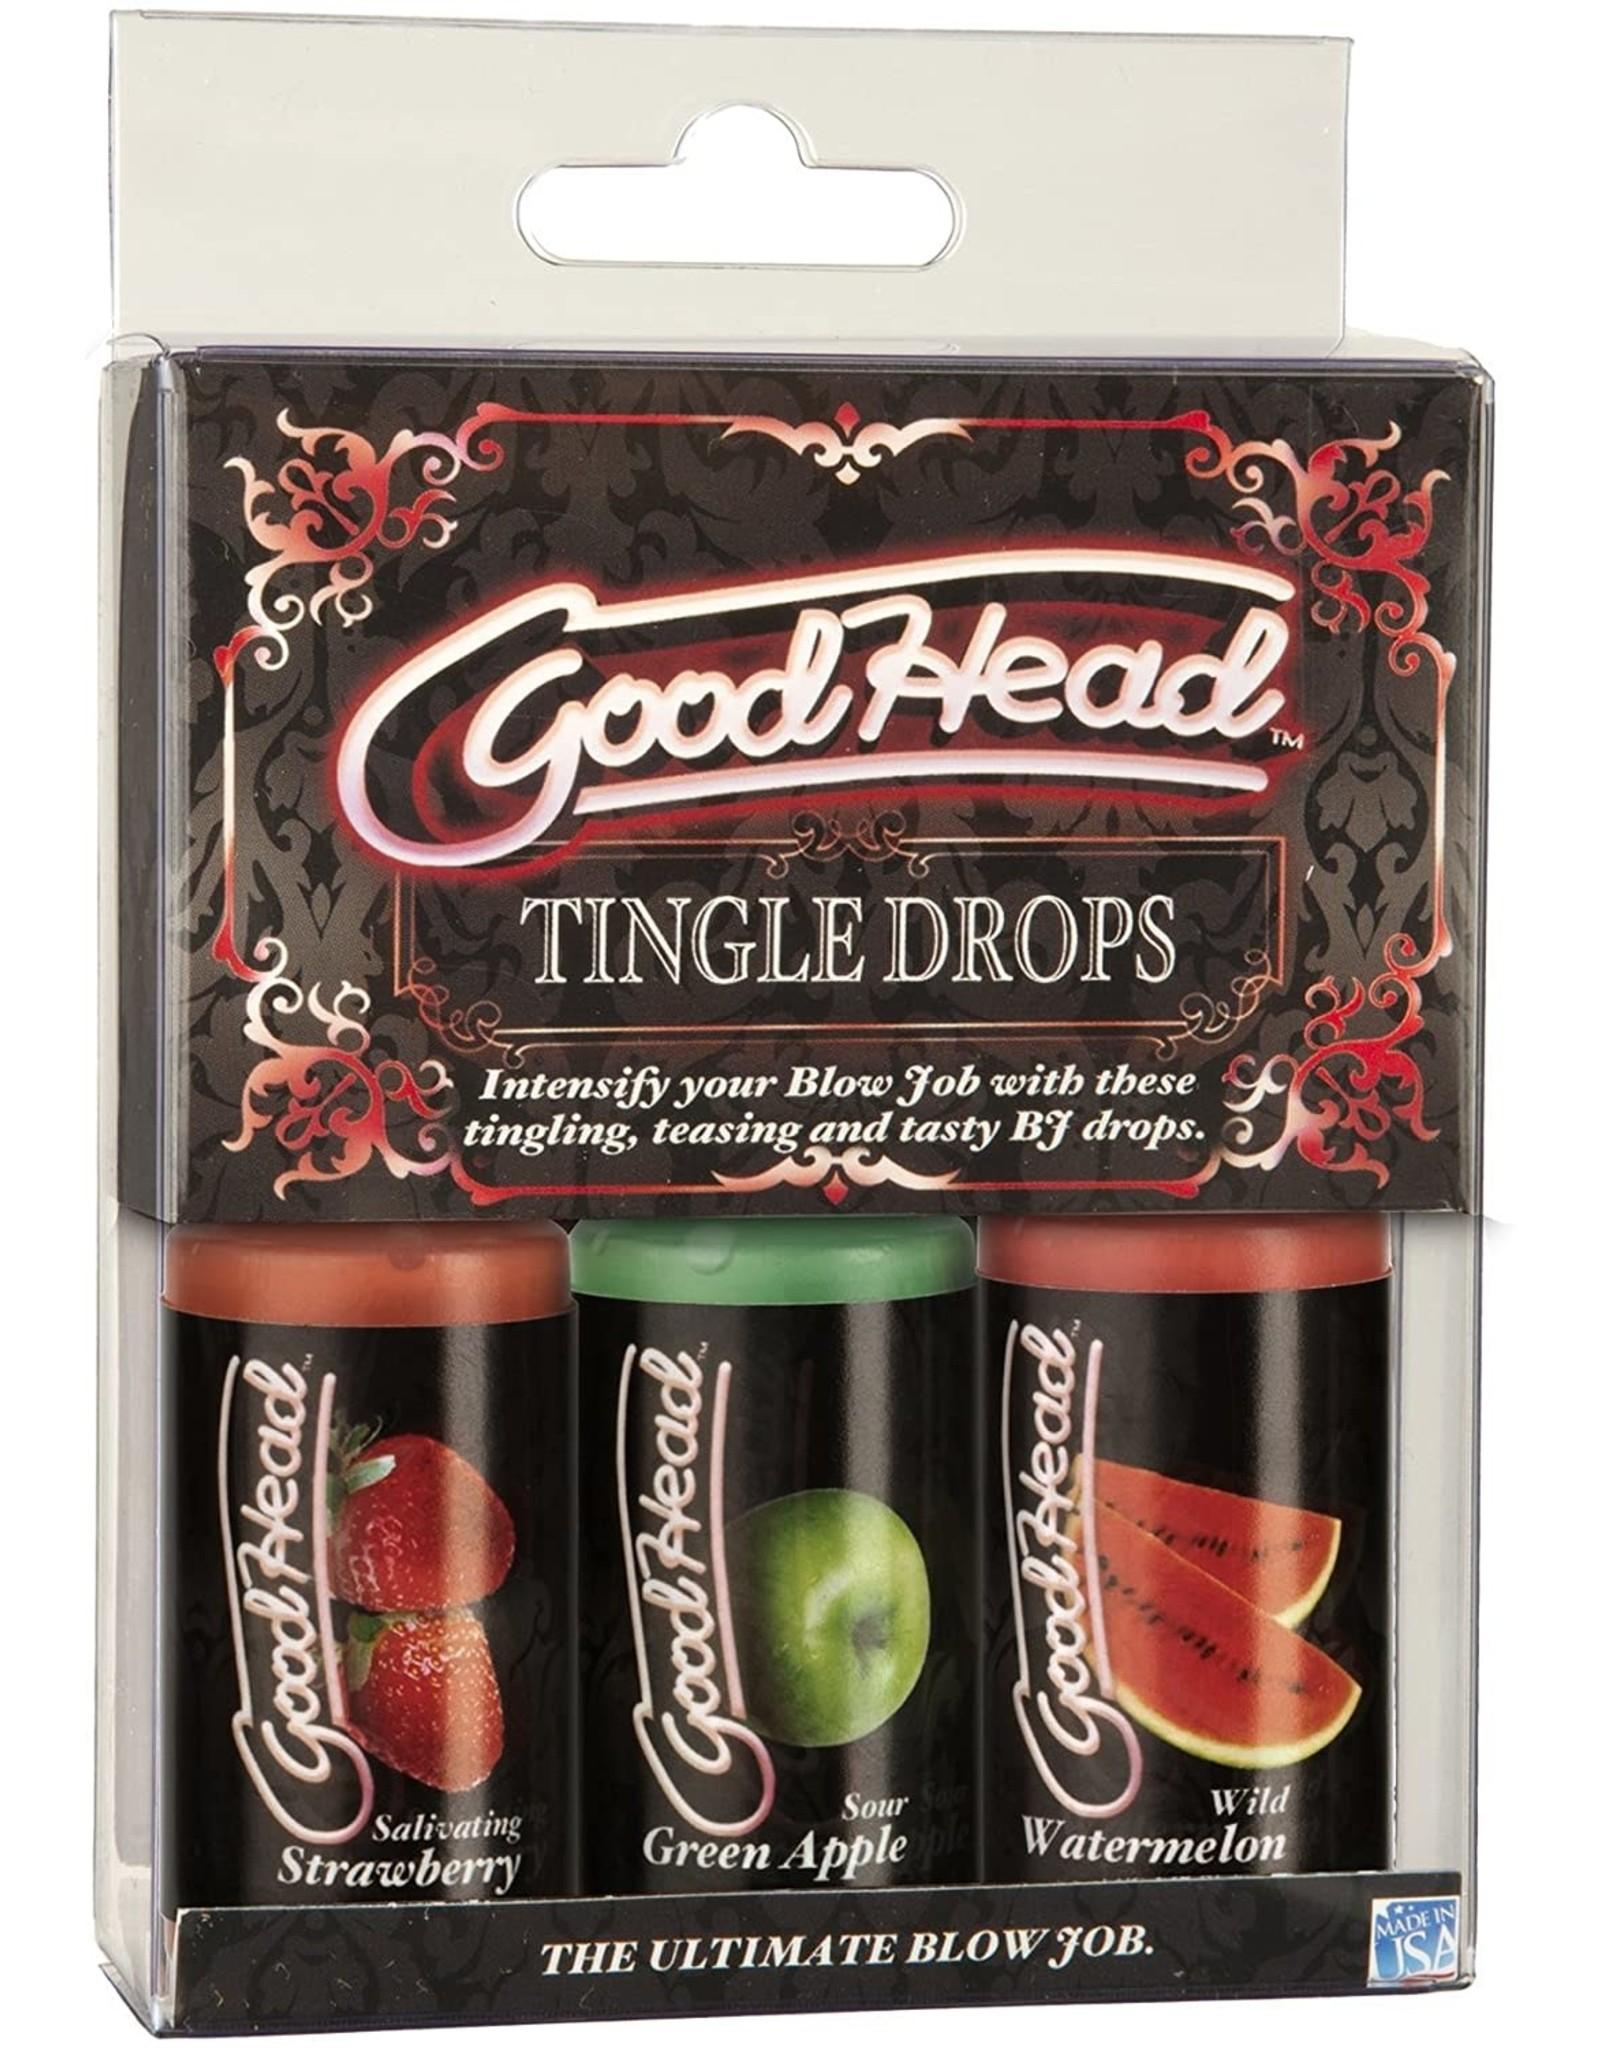 GOOD HEAD - TINGLE DROPS 3 PACK